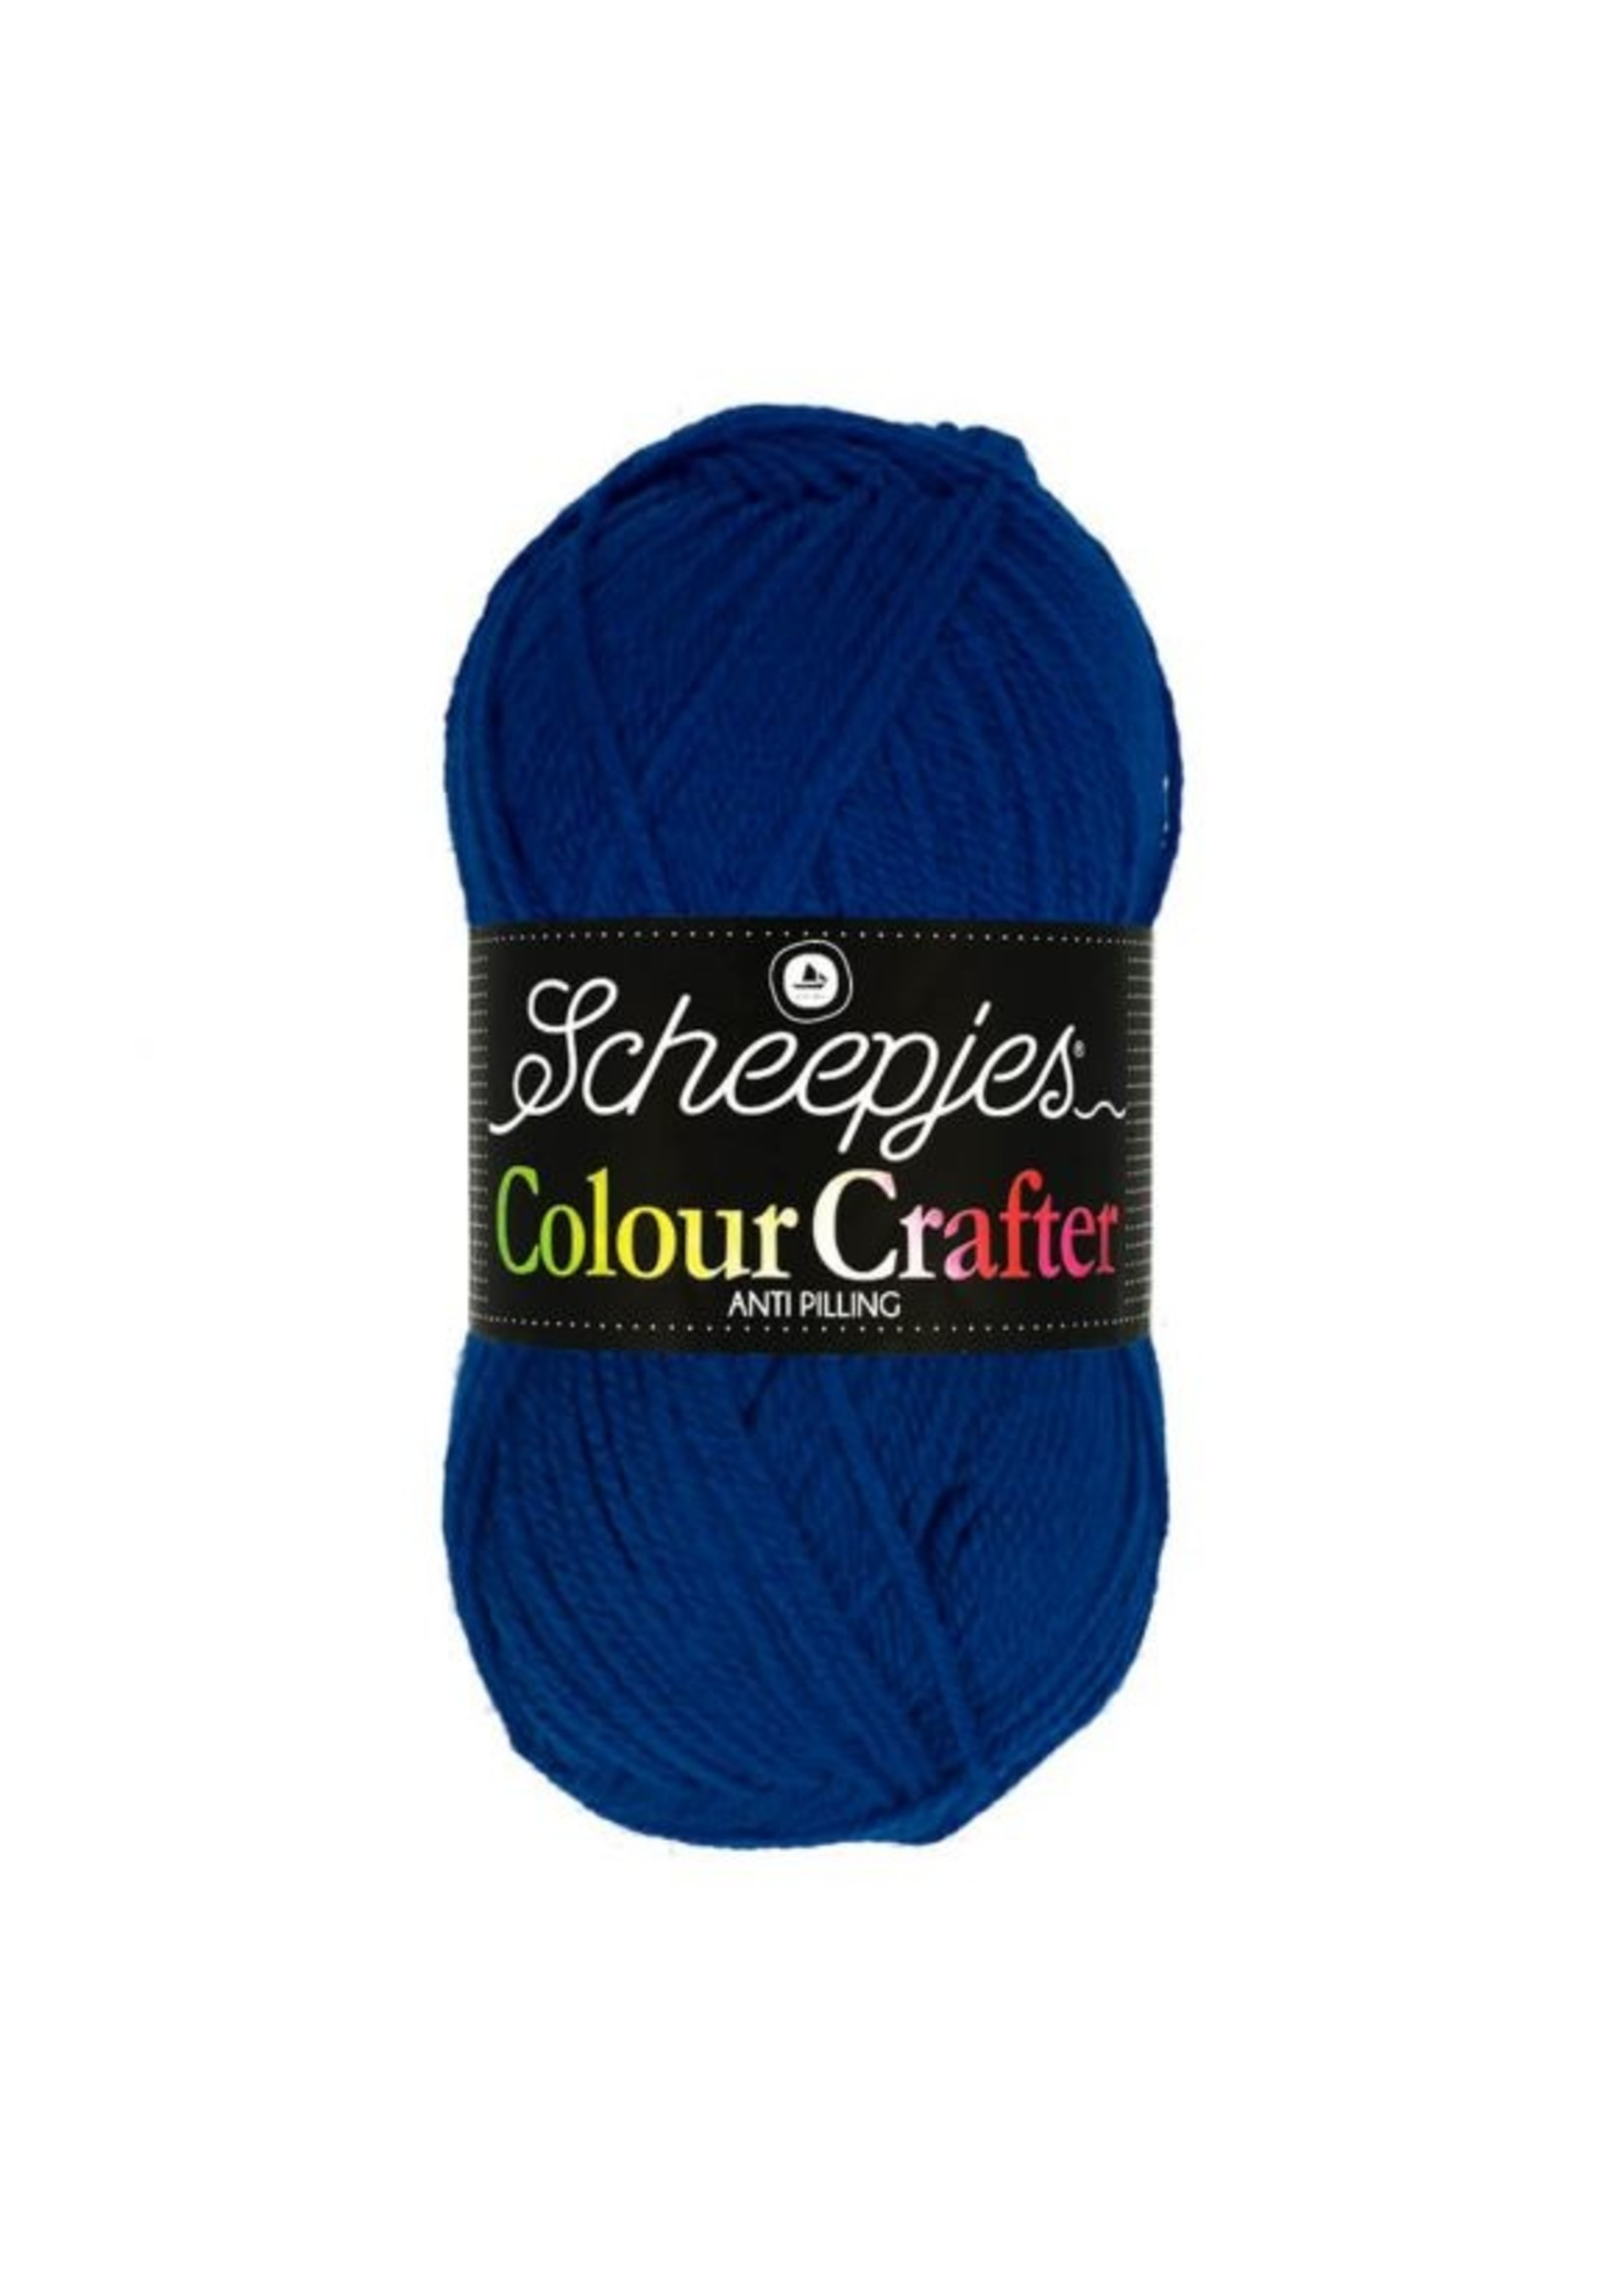 Scheepjes 1117 Delft - Colour Crafter 100gr